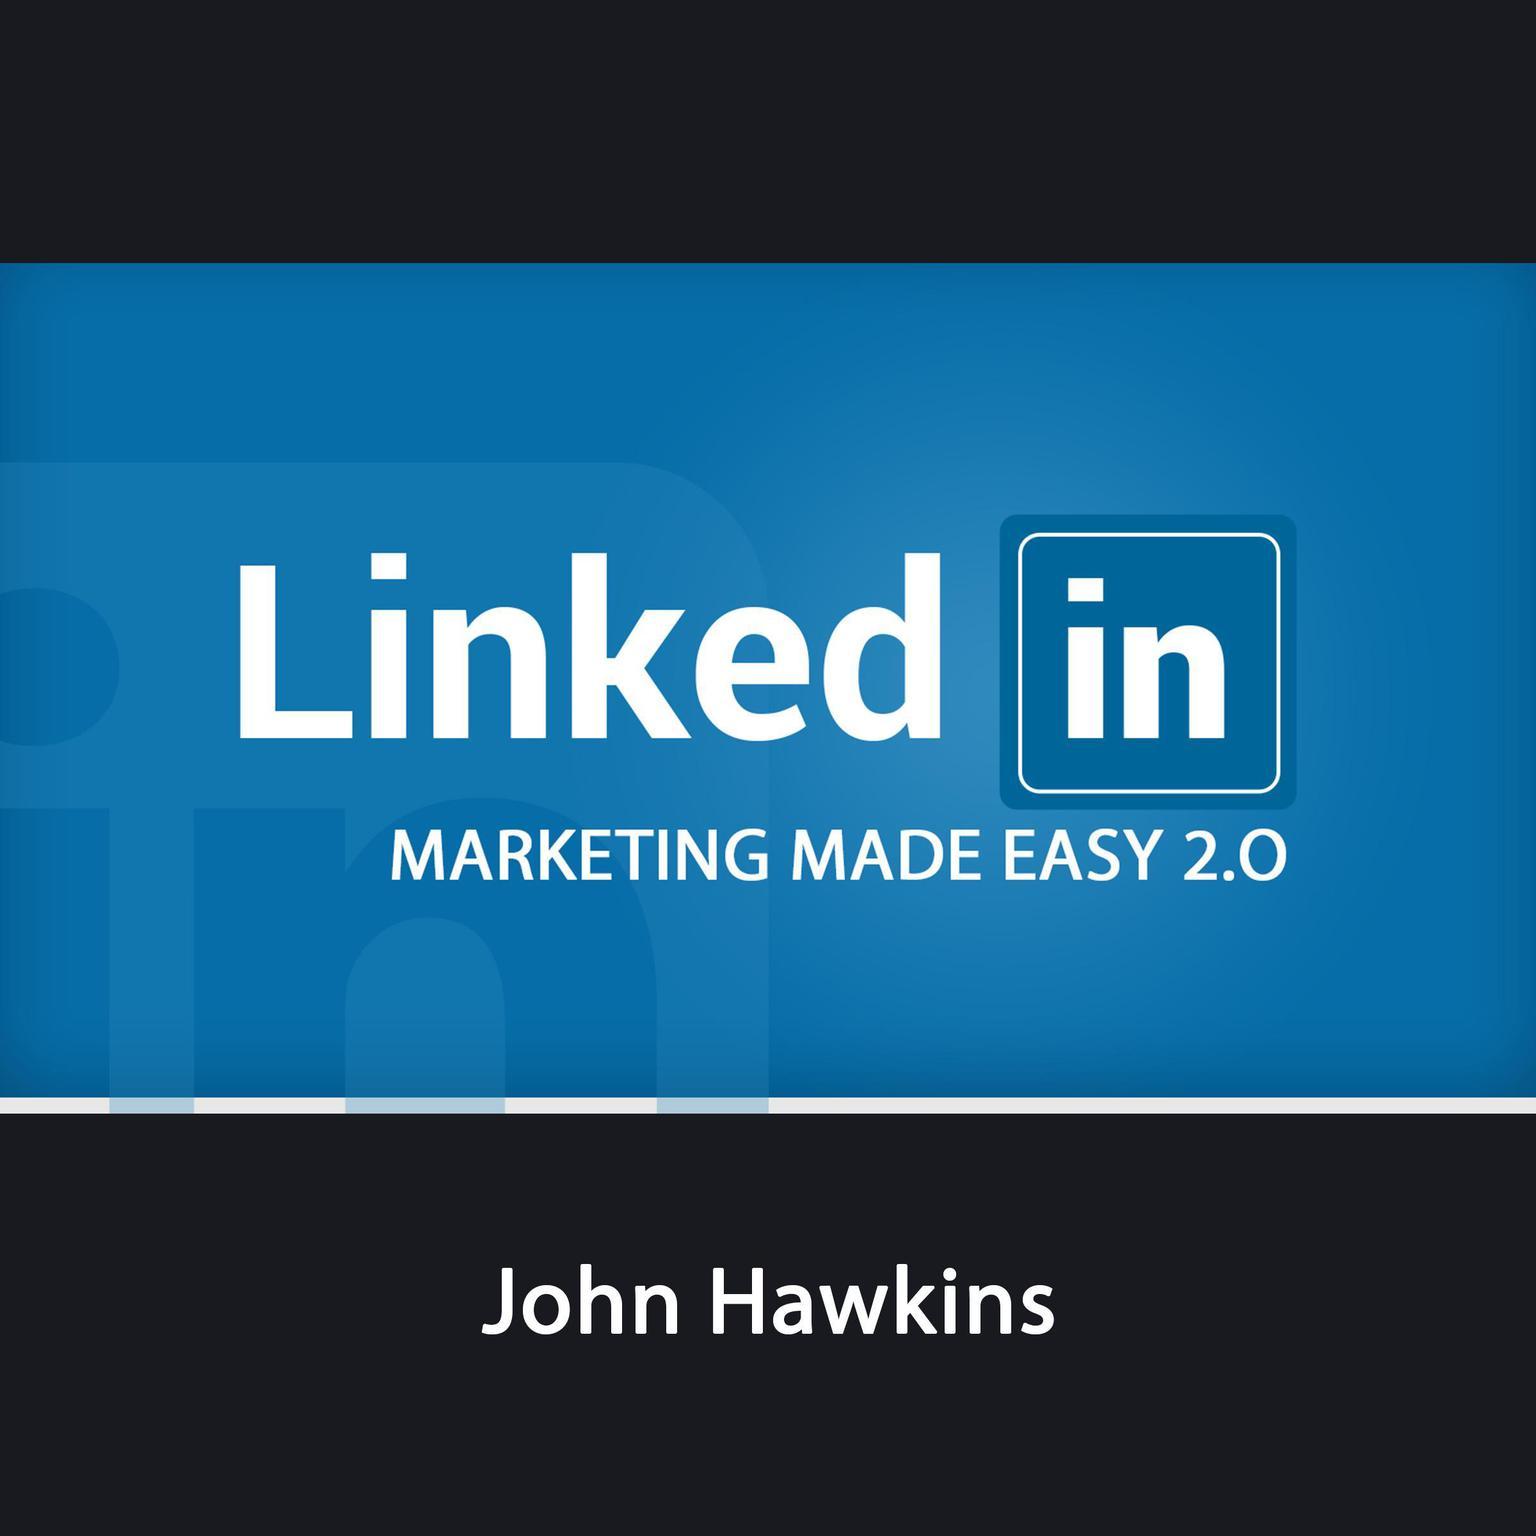 Linkedin Marketing 2 0 Made Easy Audiobook